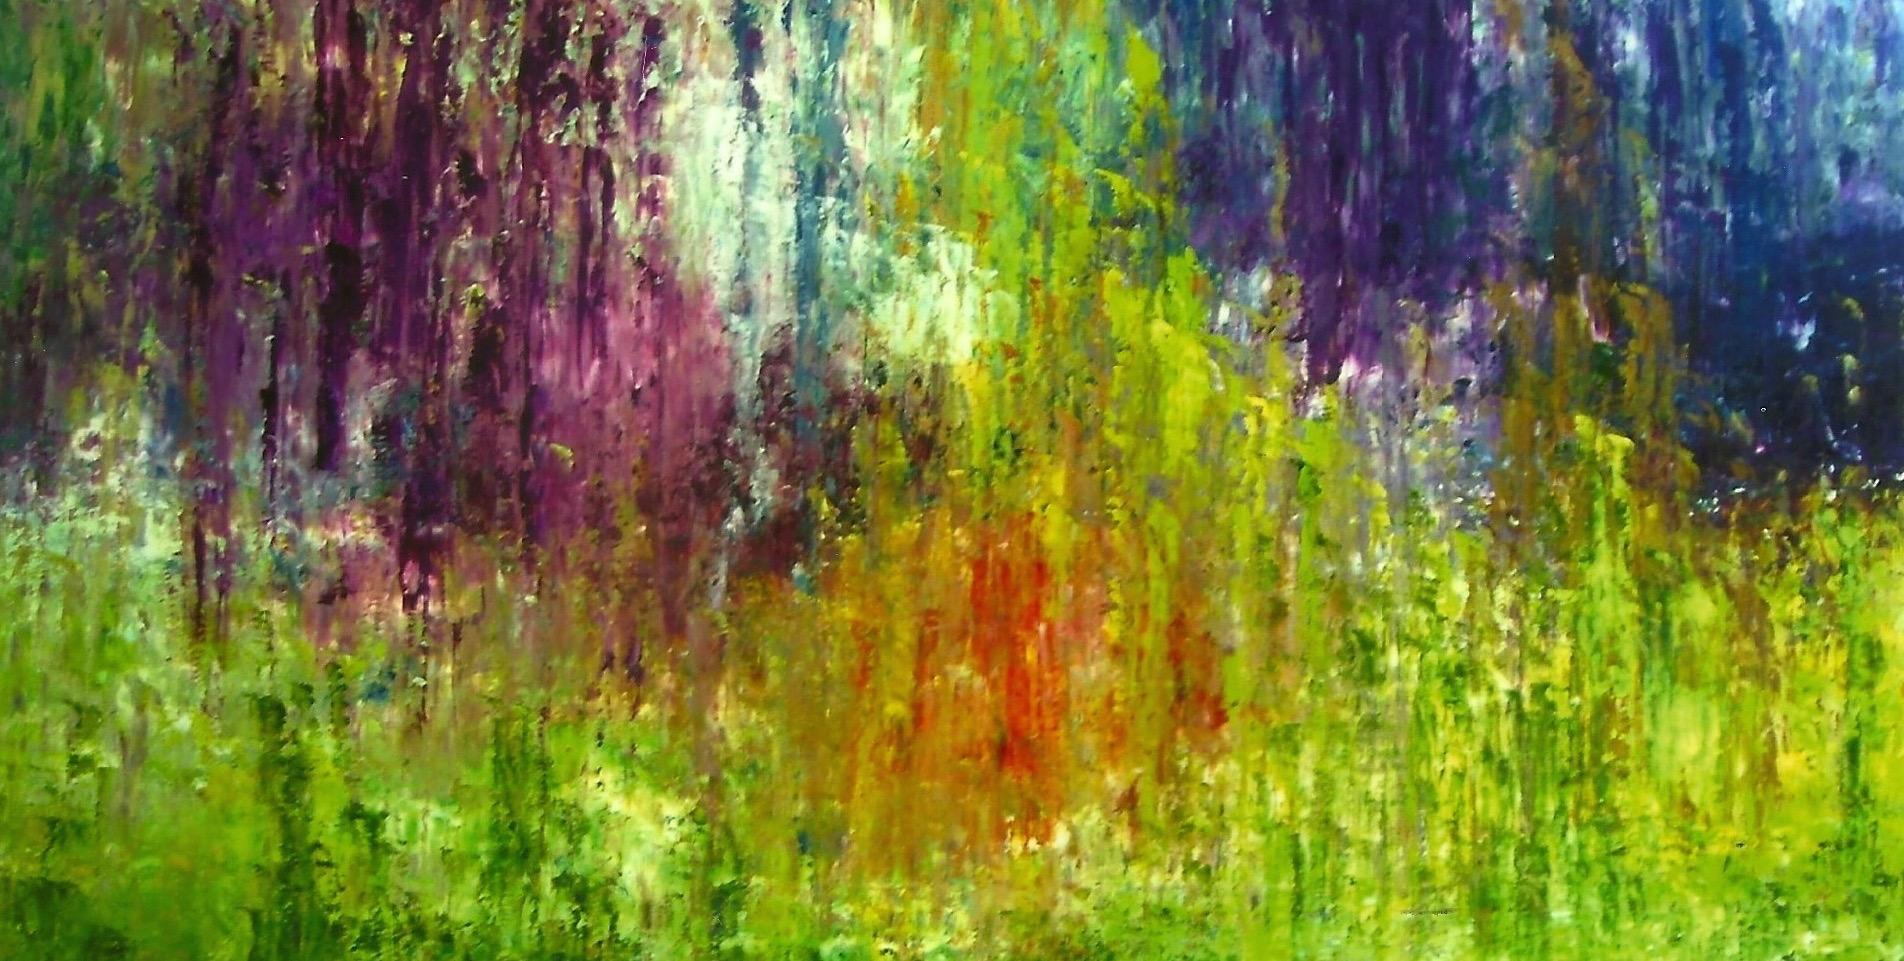 A Summer Rain 24x36 Oil on Canvas (sold)